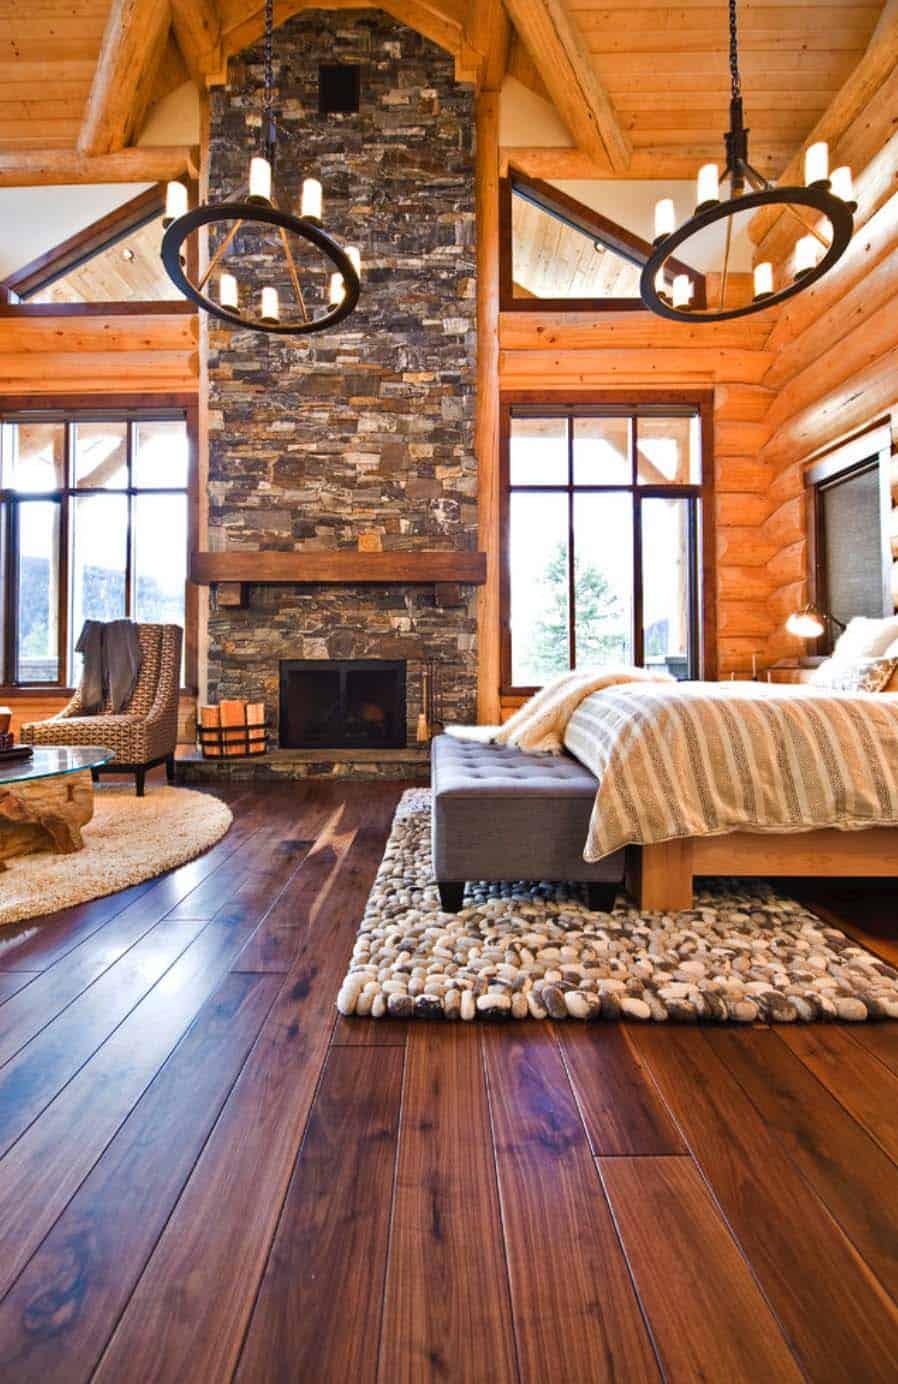 log-cabin-style-bedrooms-007-1-kindesign